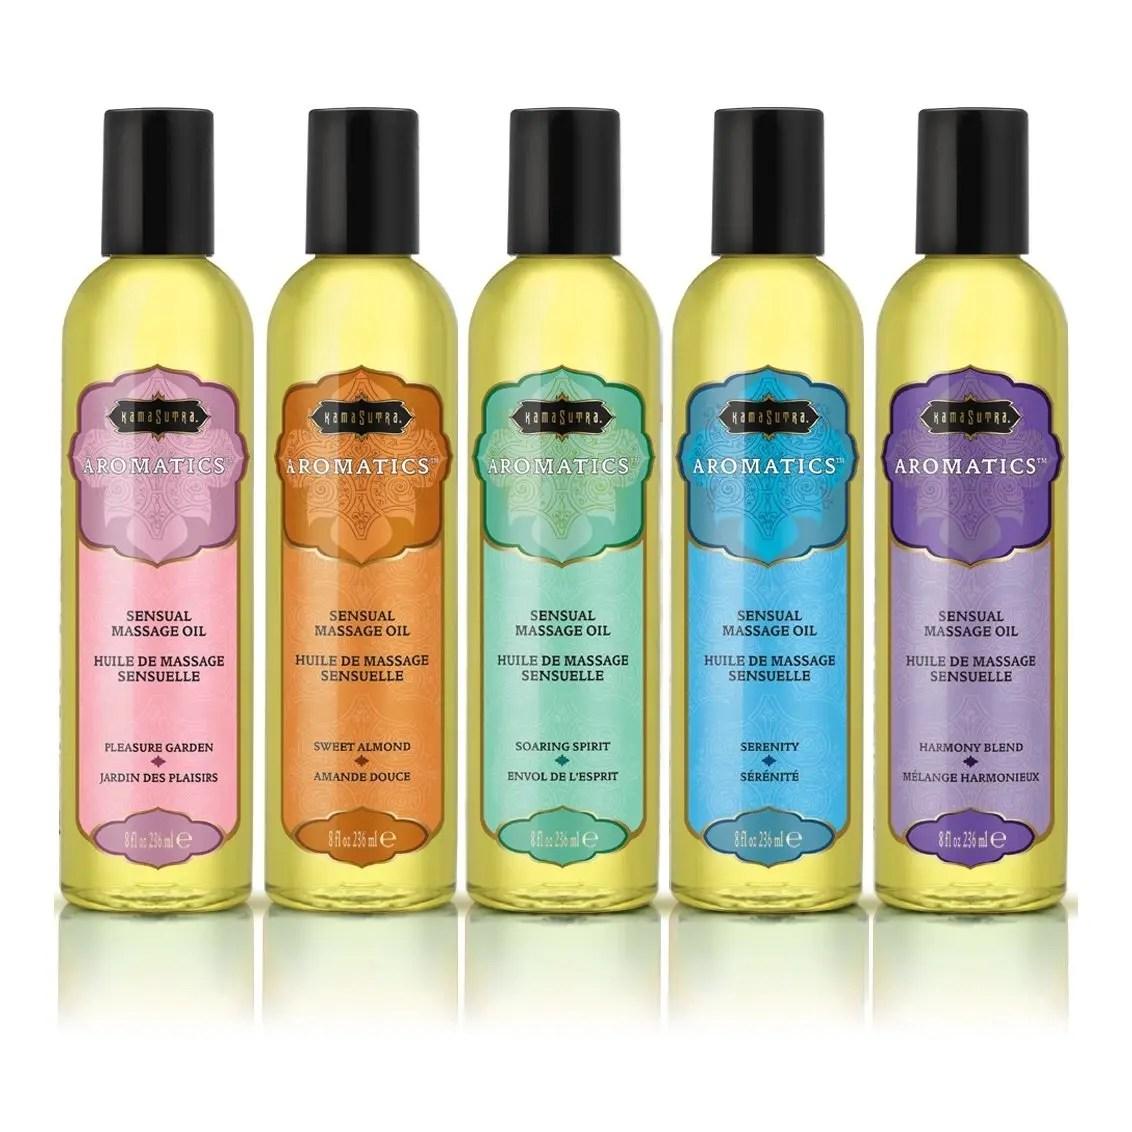 Kama Sutra Aromatic Massage Oil 8oz